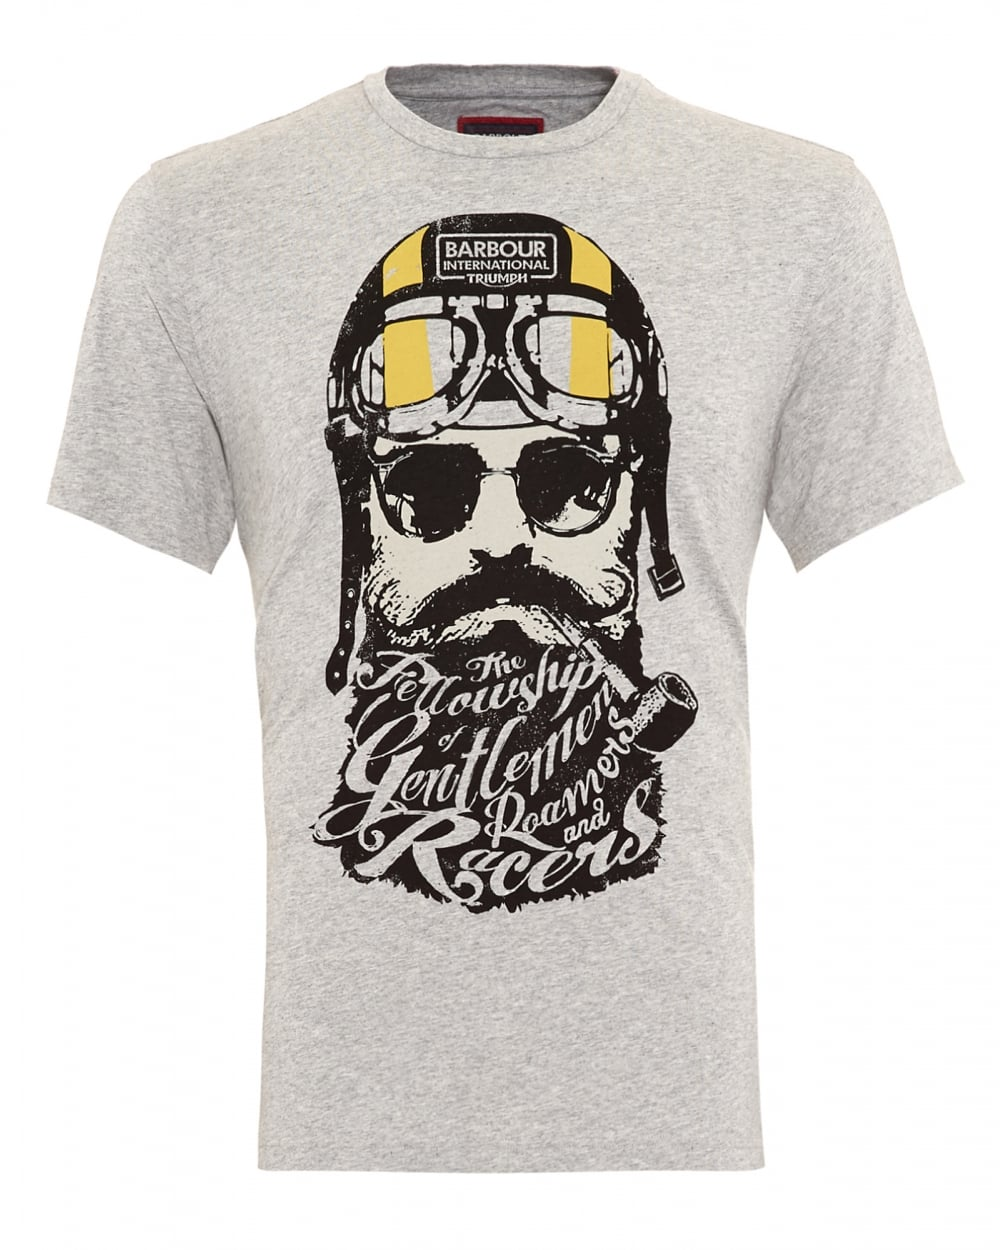 Barbour international triumph mens t shirt gentlemen for T shirts online uk